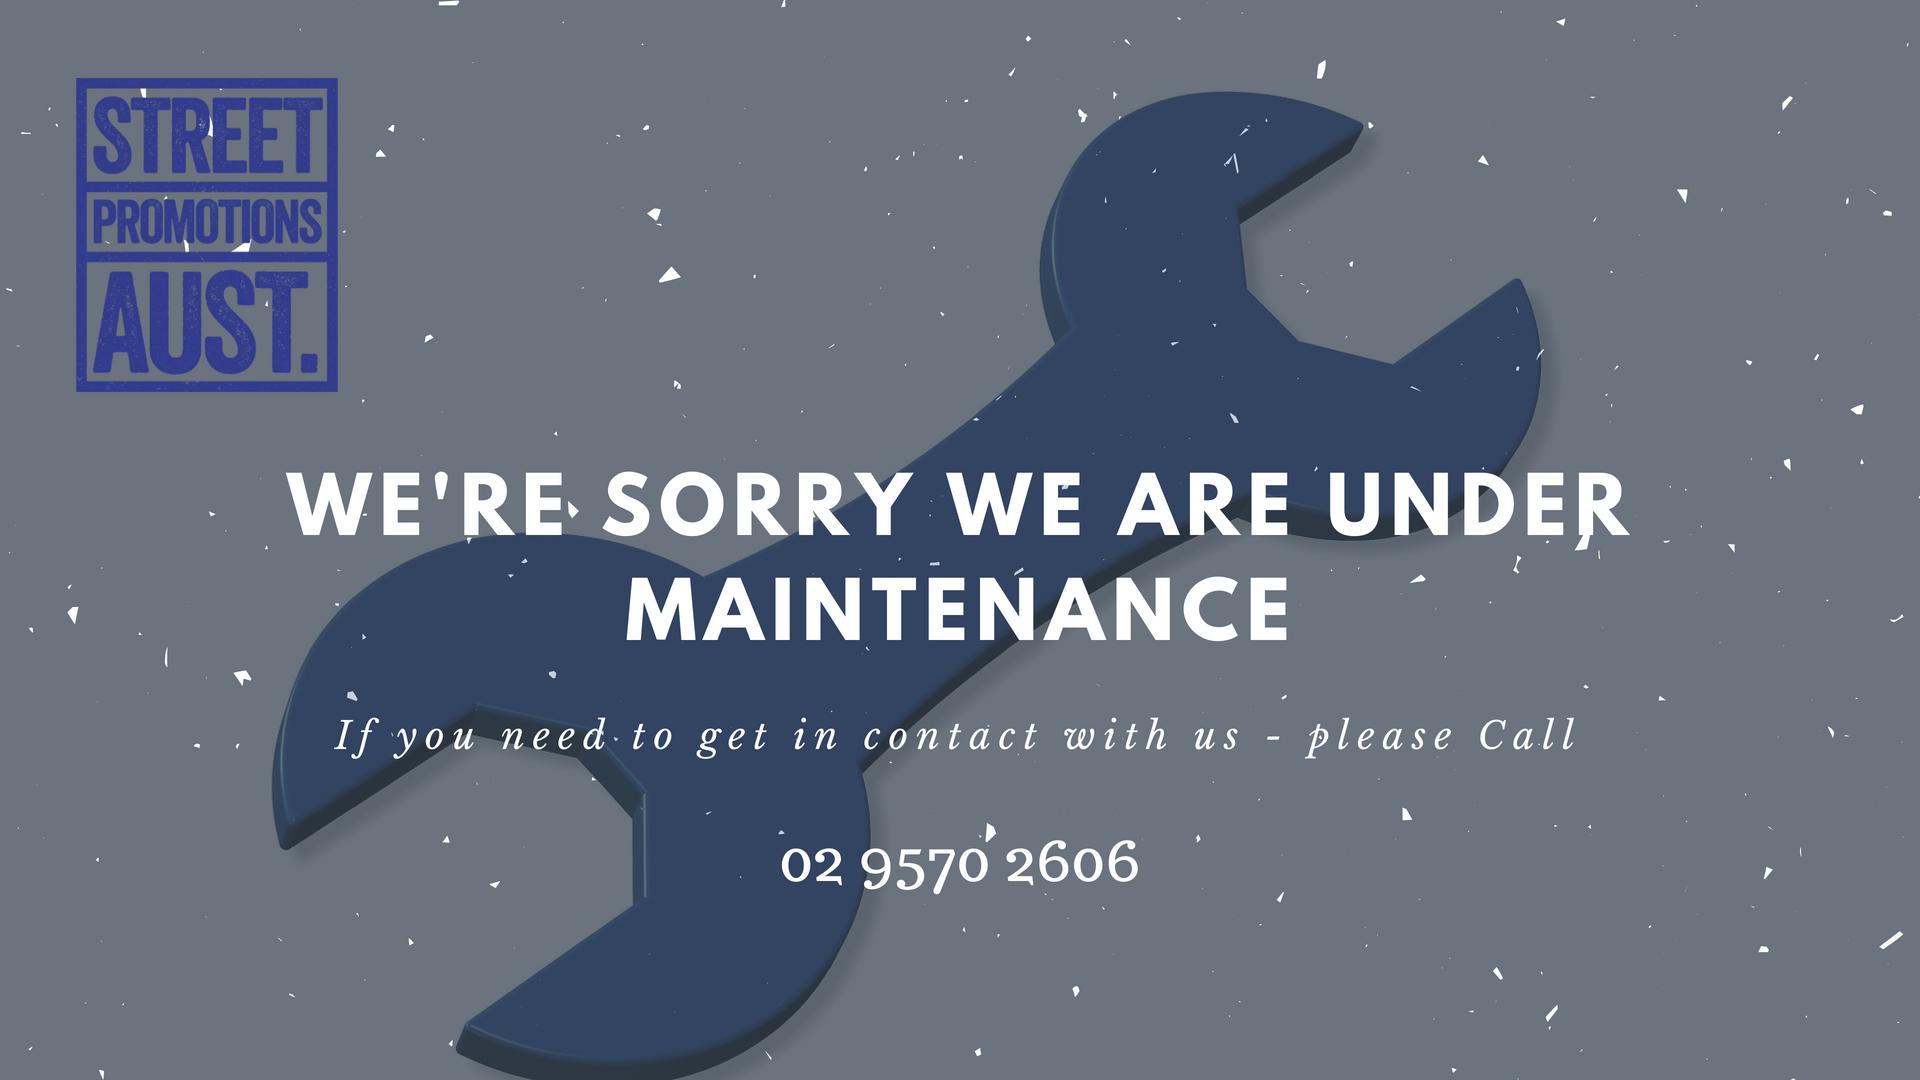 Street Promotions Website Under maintenance